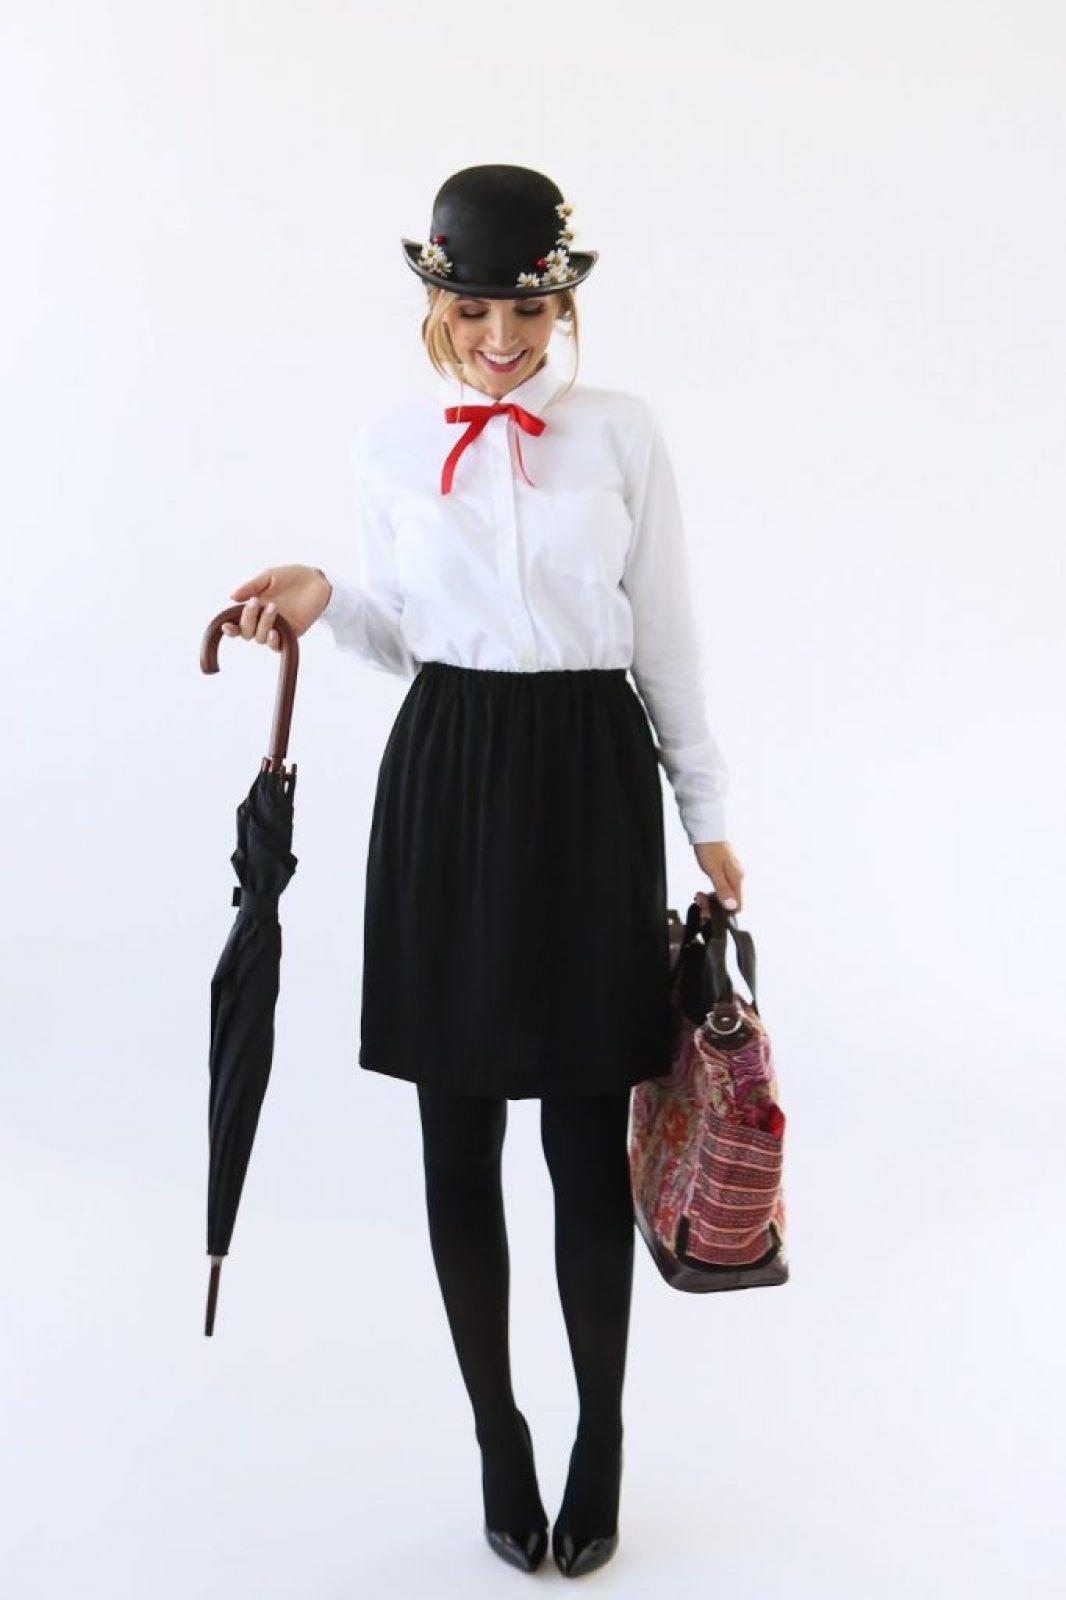 mary-poppins-costume-merricks-art